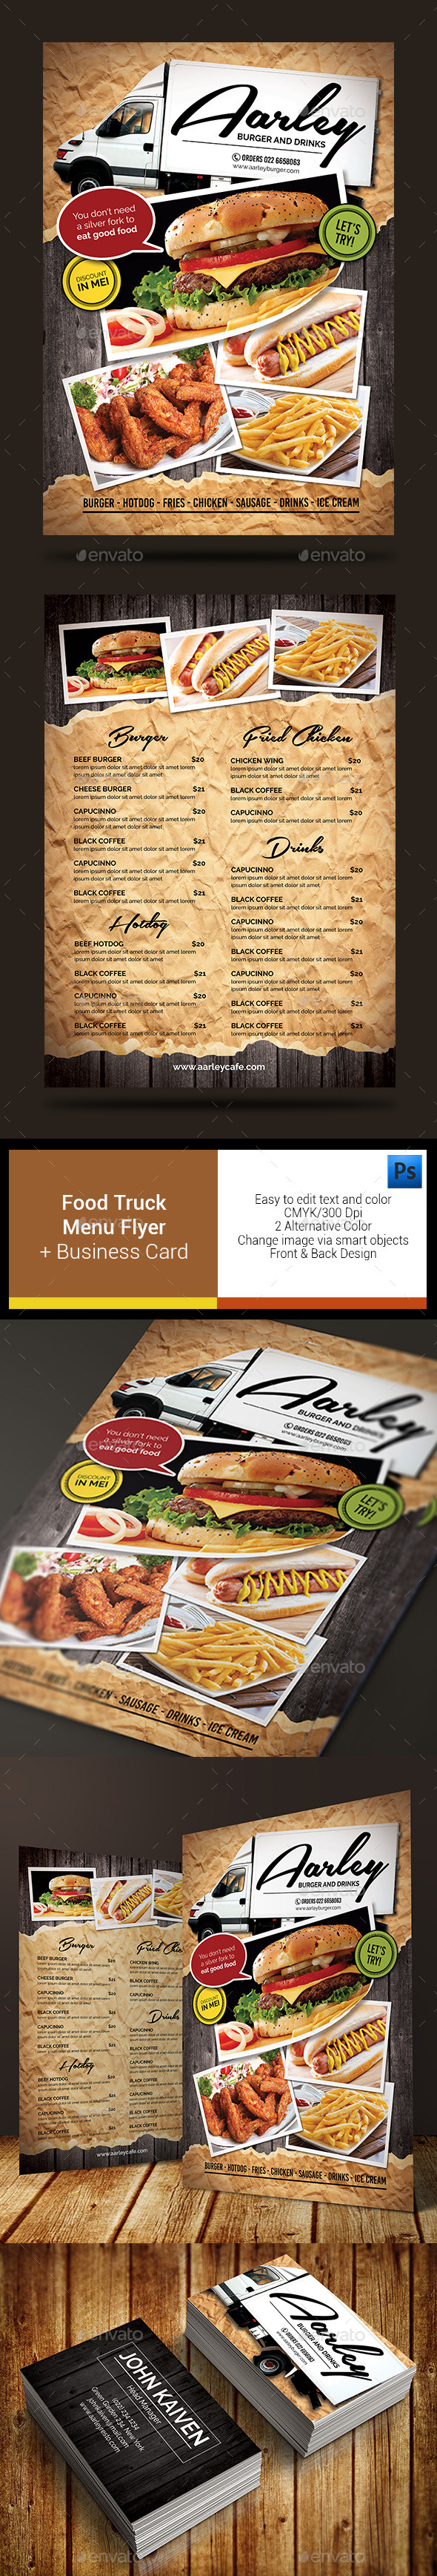 Food Truck Menu Flyer + Business Card - Food Menus Print Templates